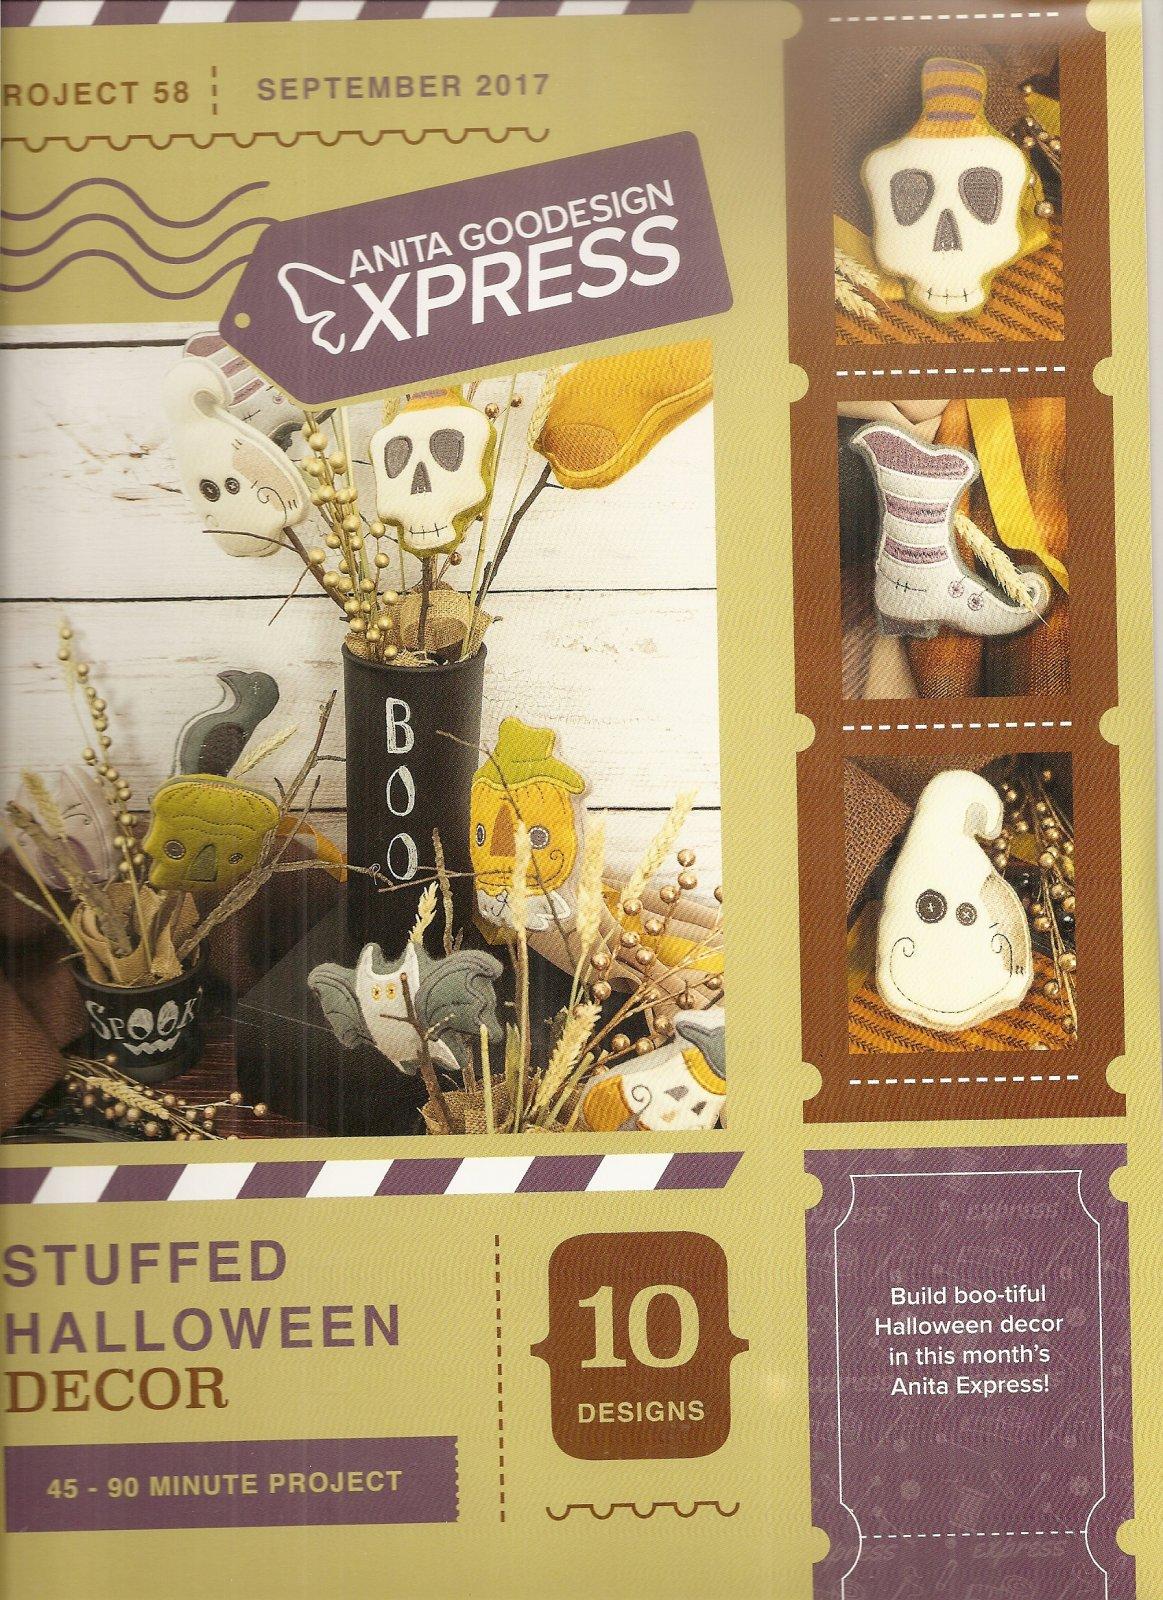 Anita Goodesign Express Stuffed Halloween Decor